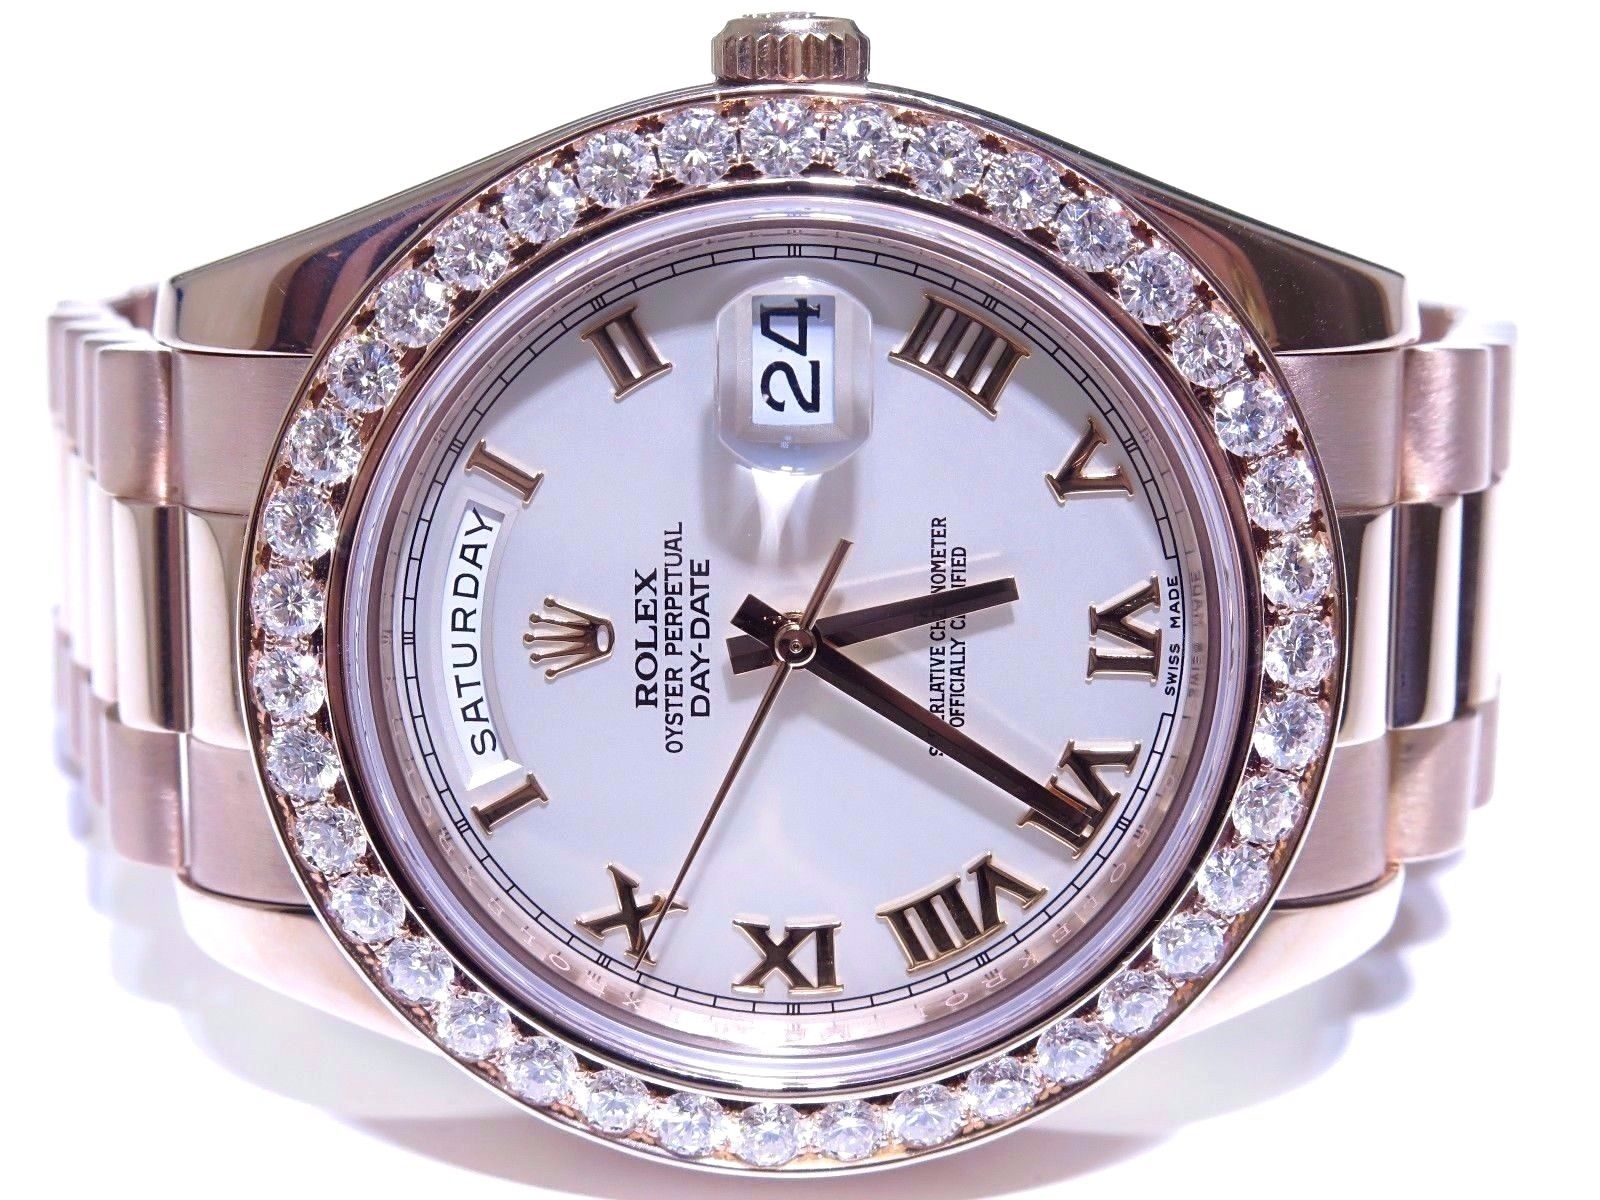 Rolex President Day Date 41mm 320 Ct Diamond Bezel Watch 18k Rose Gold